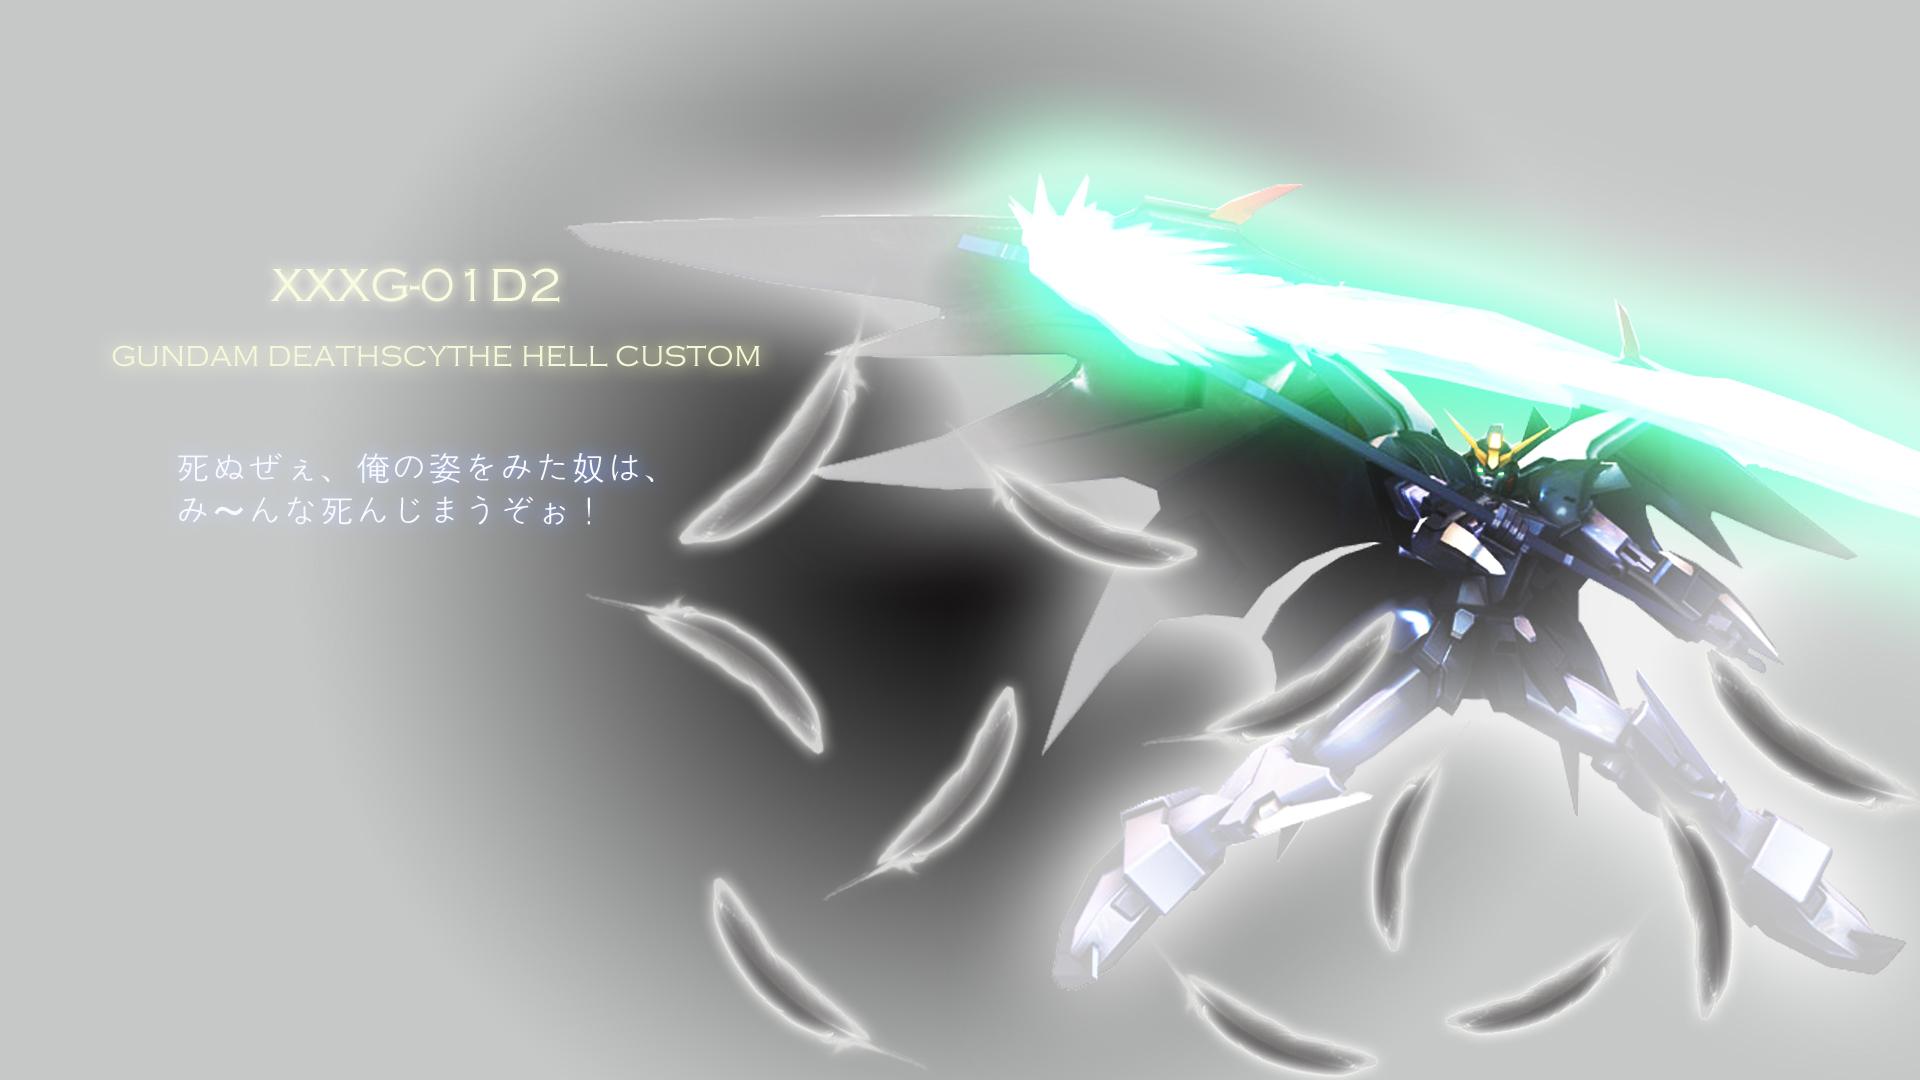 Mobile Suit Gundam Wing Hd Wallpaper 1397010 Zerochan Anime